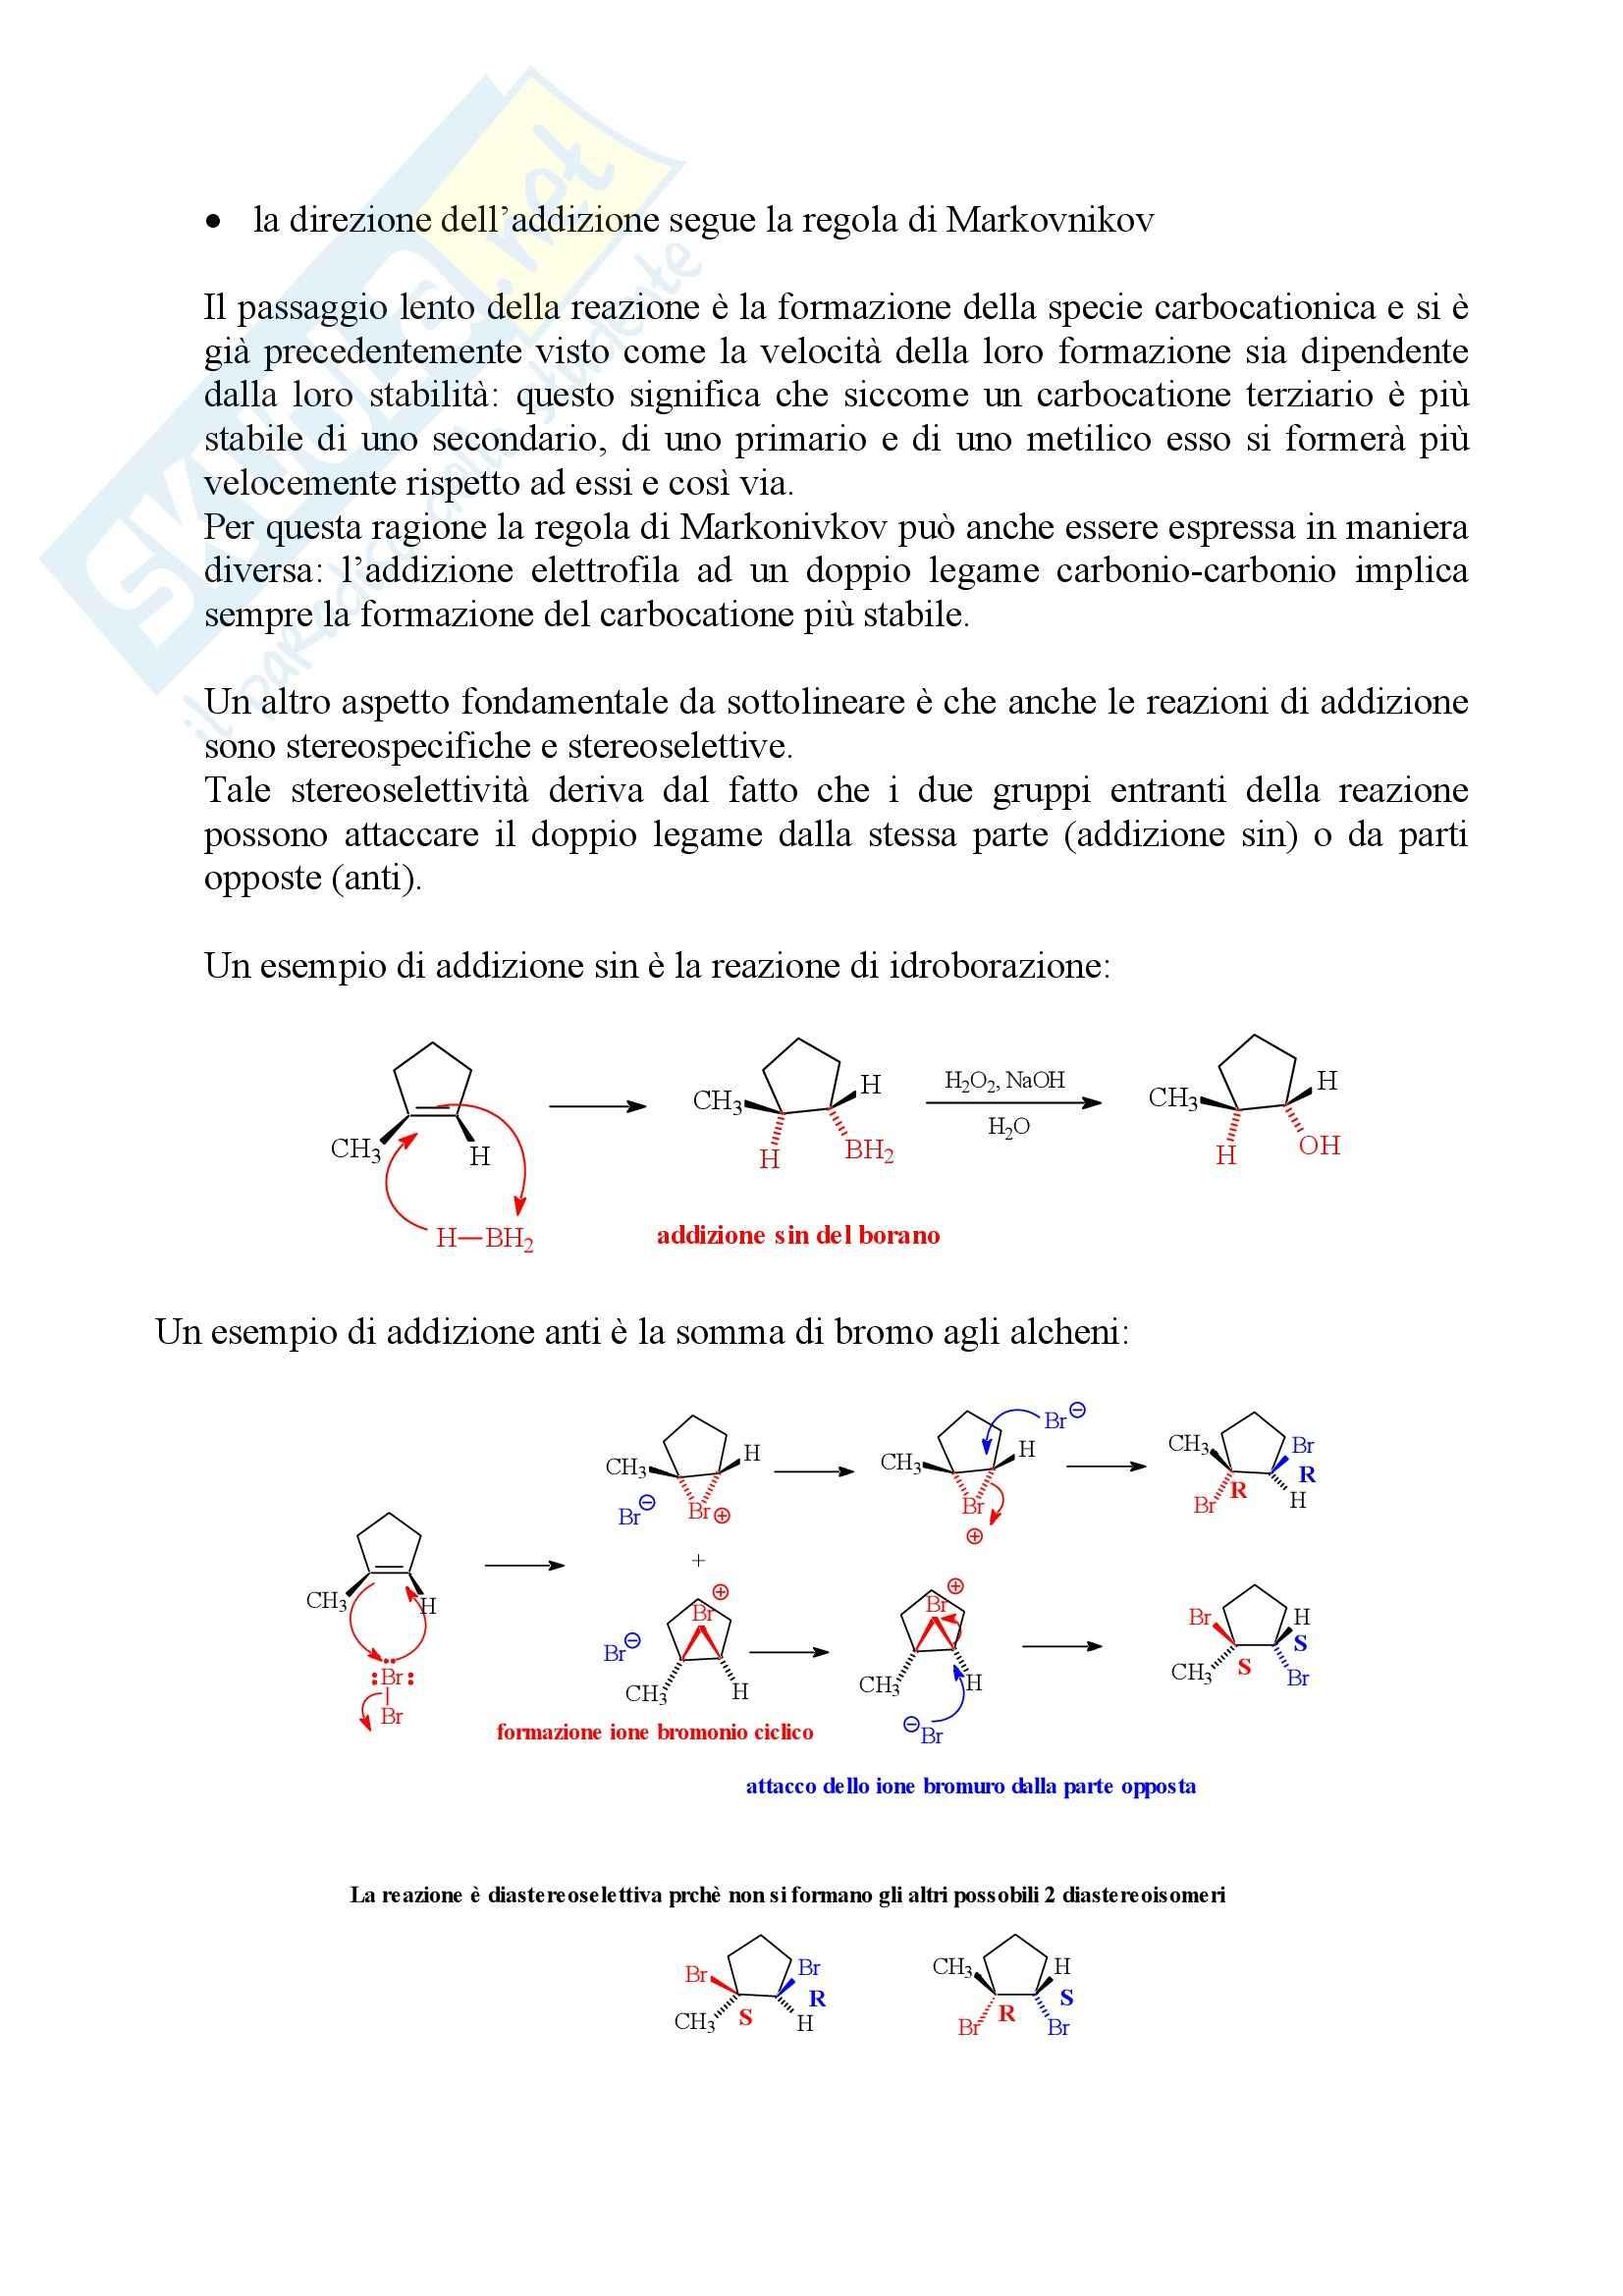 Chimica organica - Appunti Pag. 36